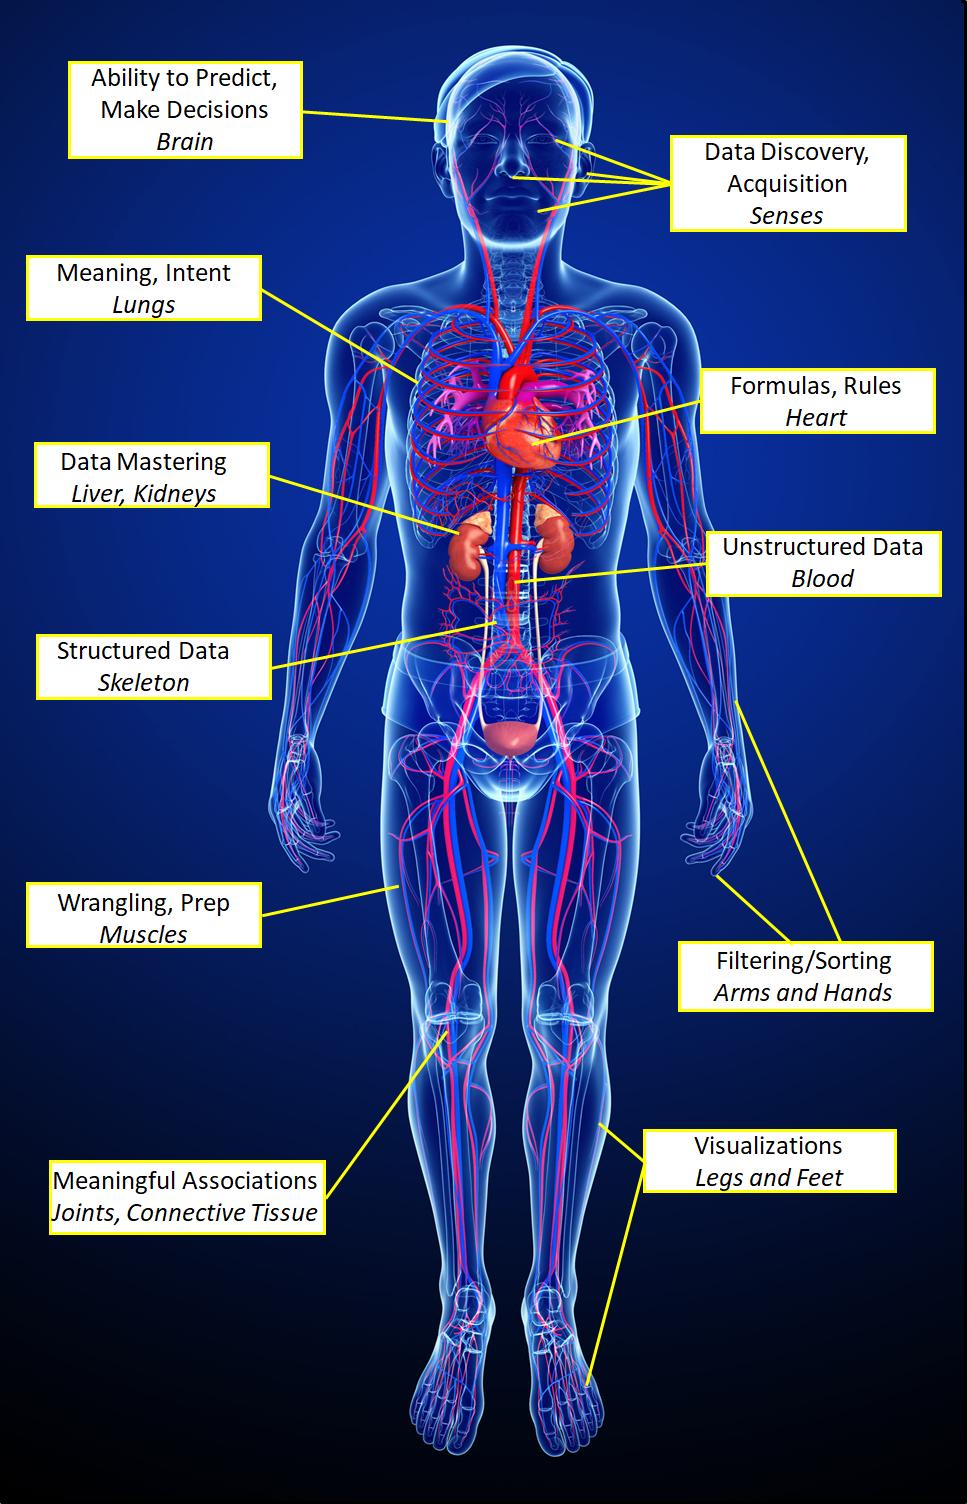 Anatomy of Insight